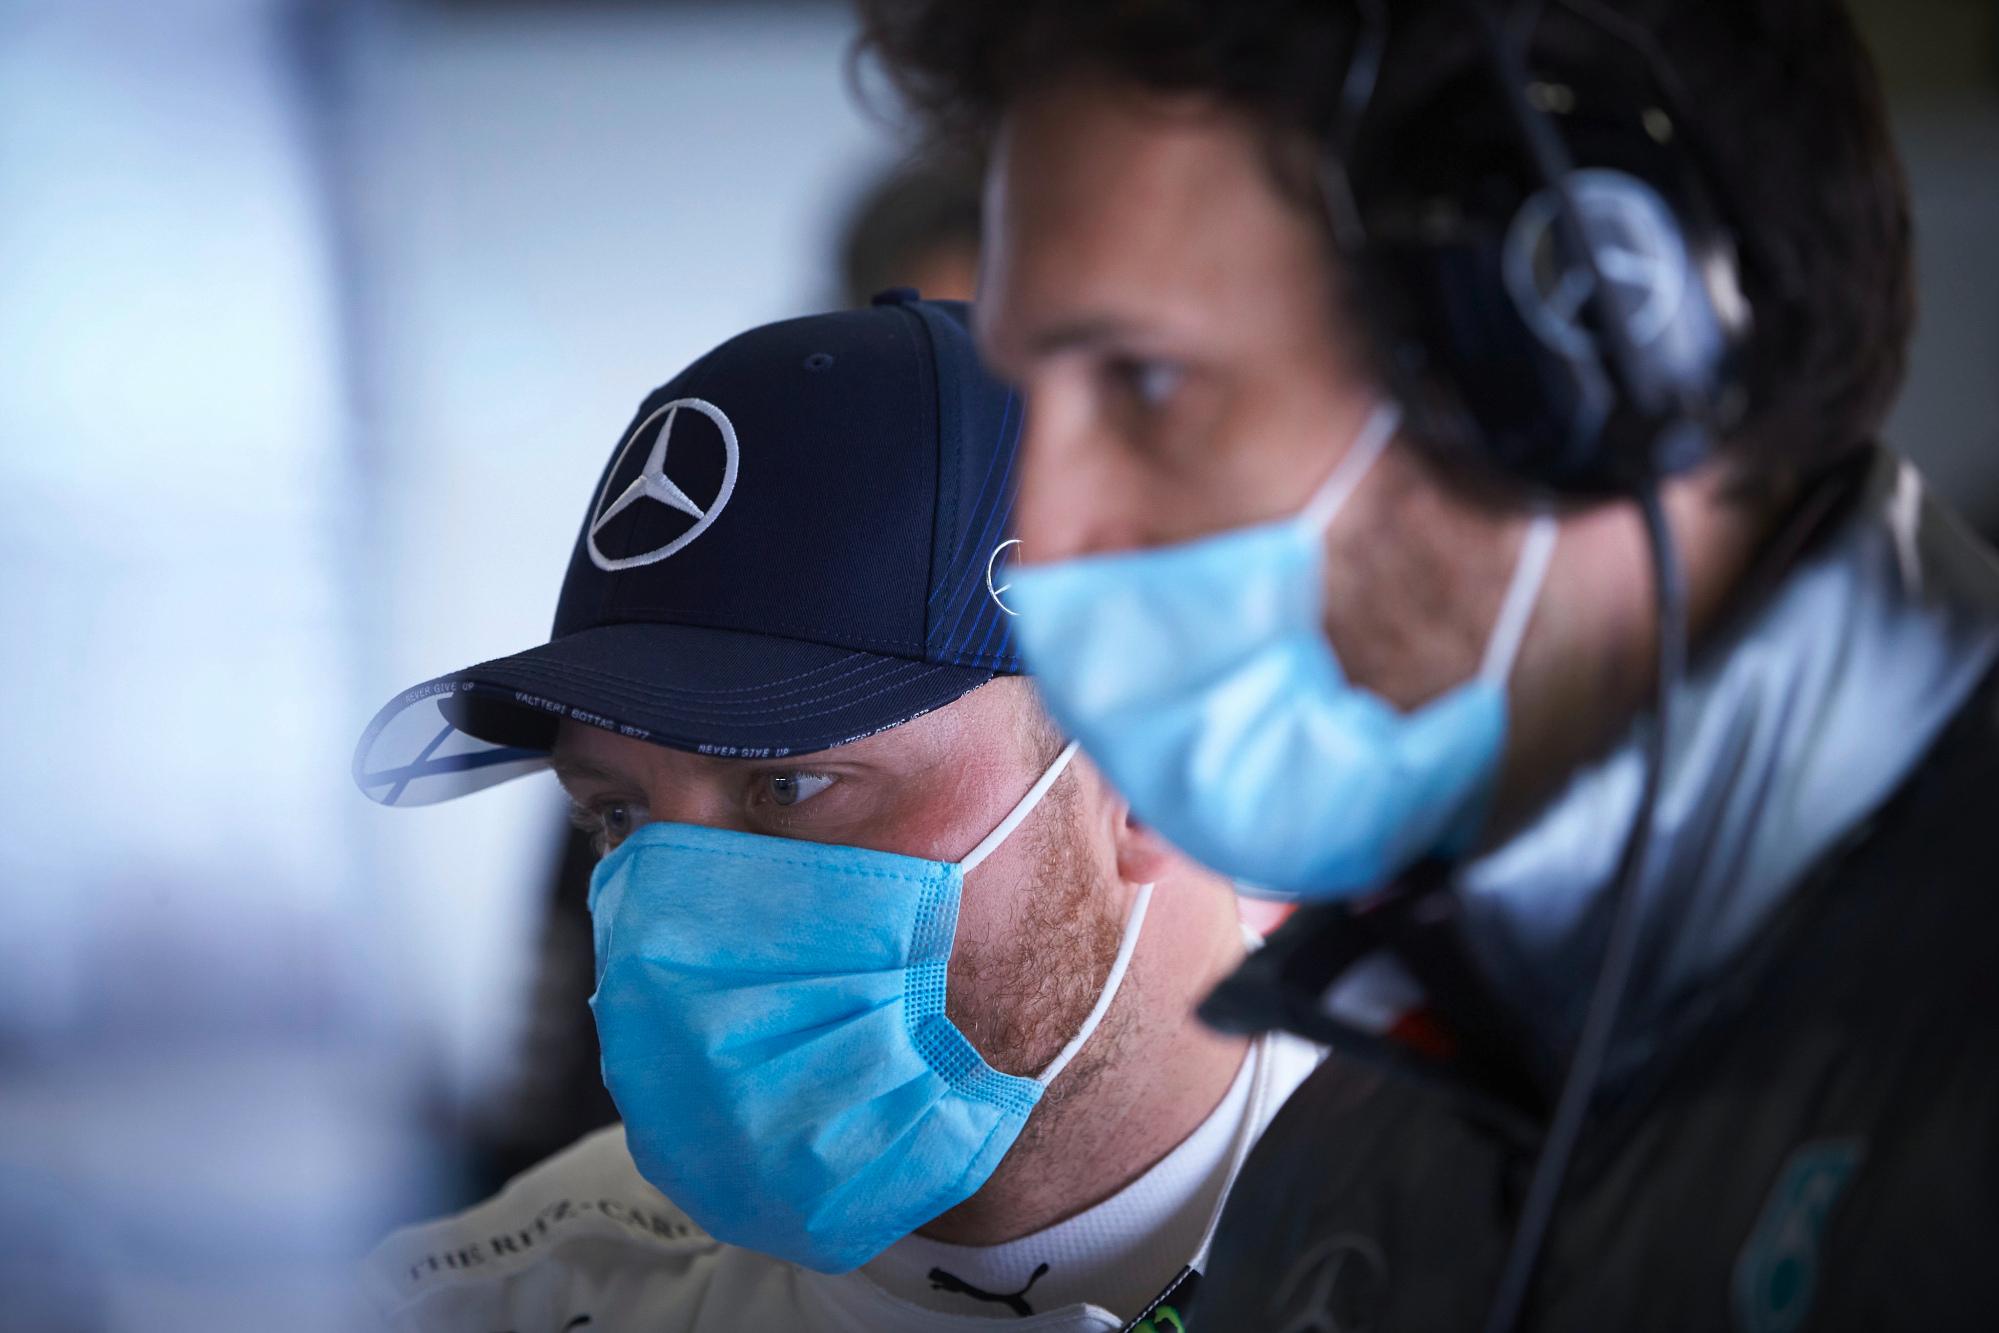 Valtteri Bottas, 2020 Silverstone test